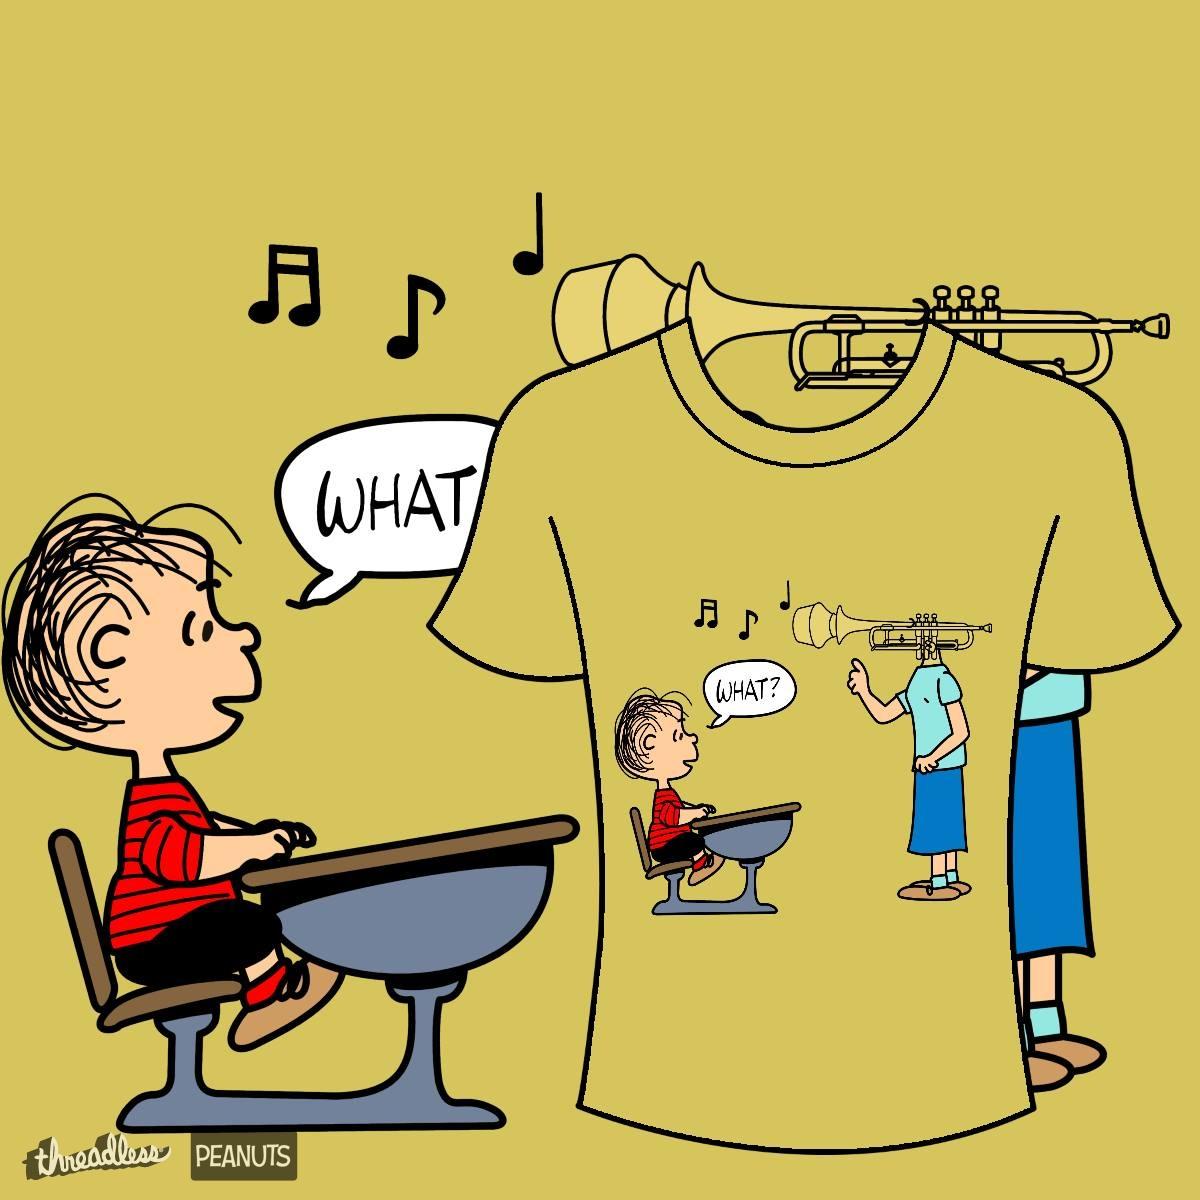 Score Trumpet Head by 9teen on Threadless